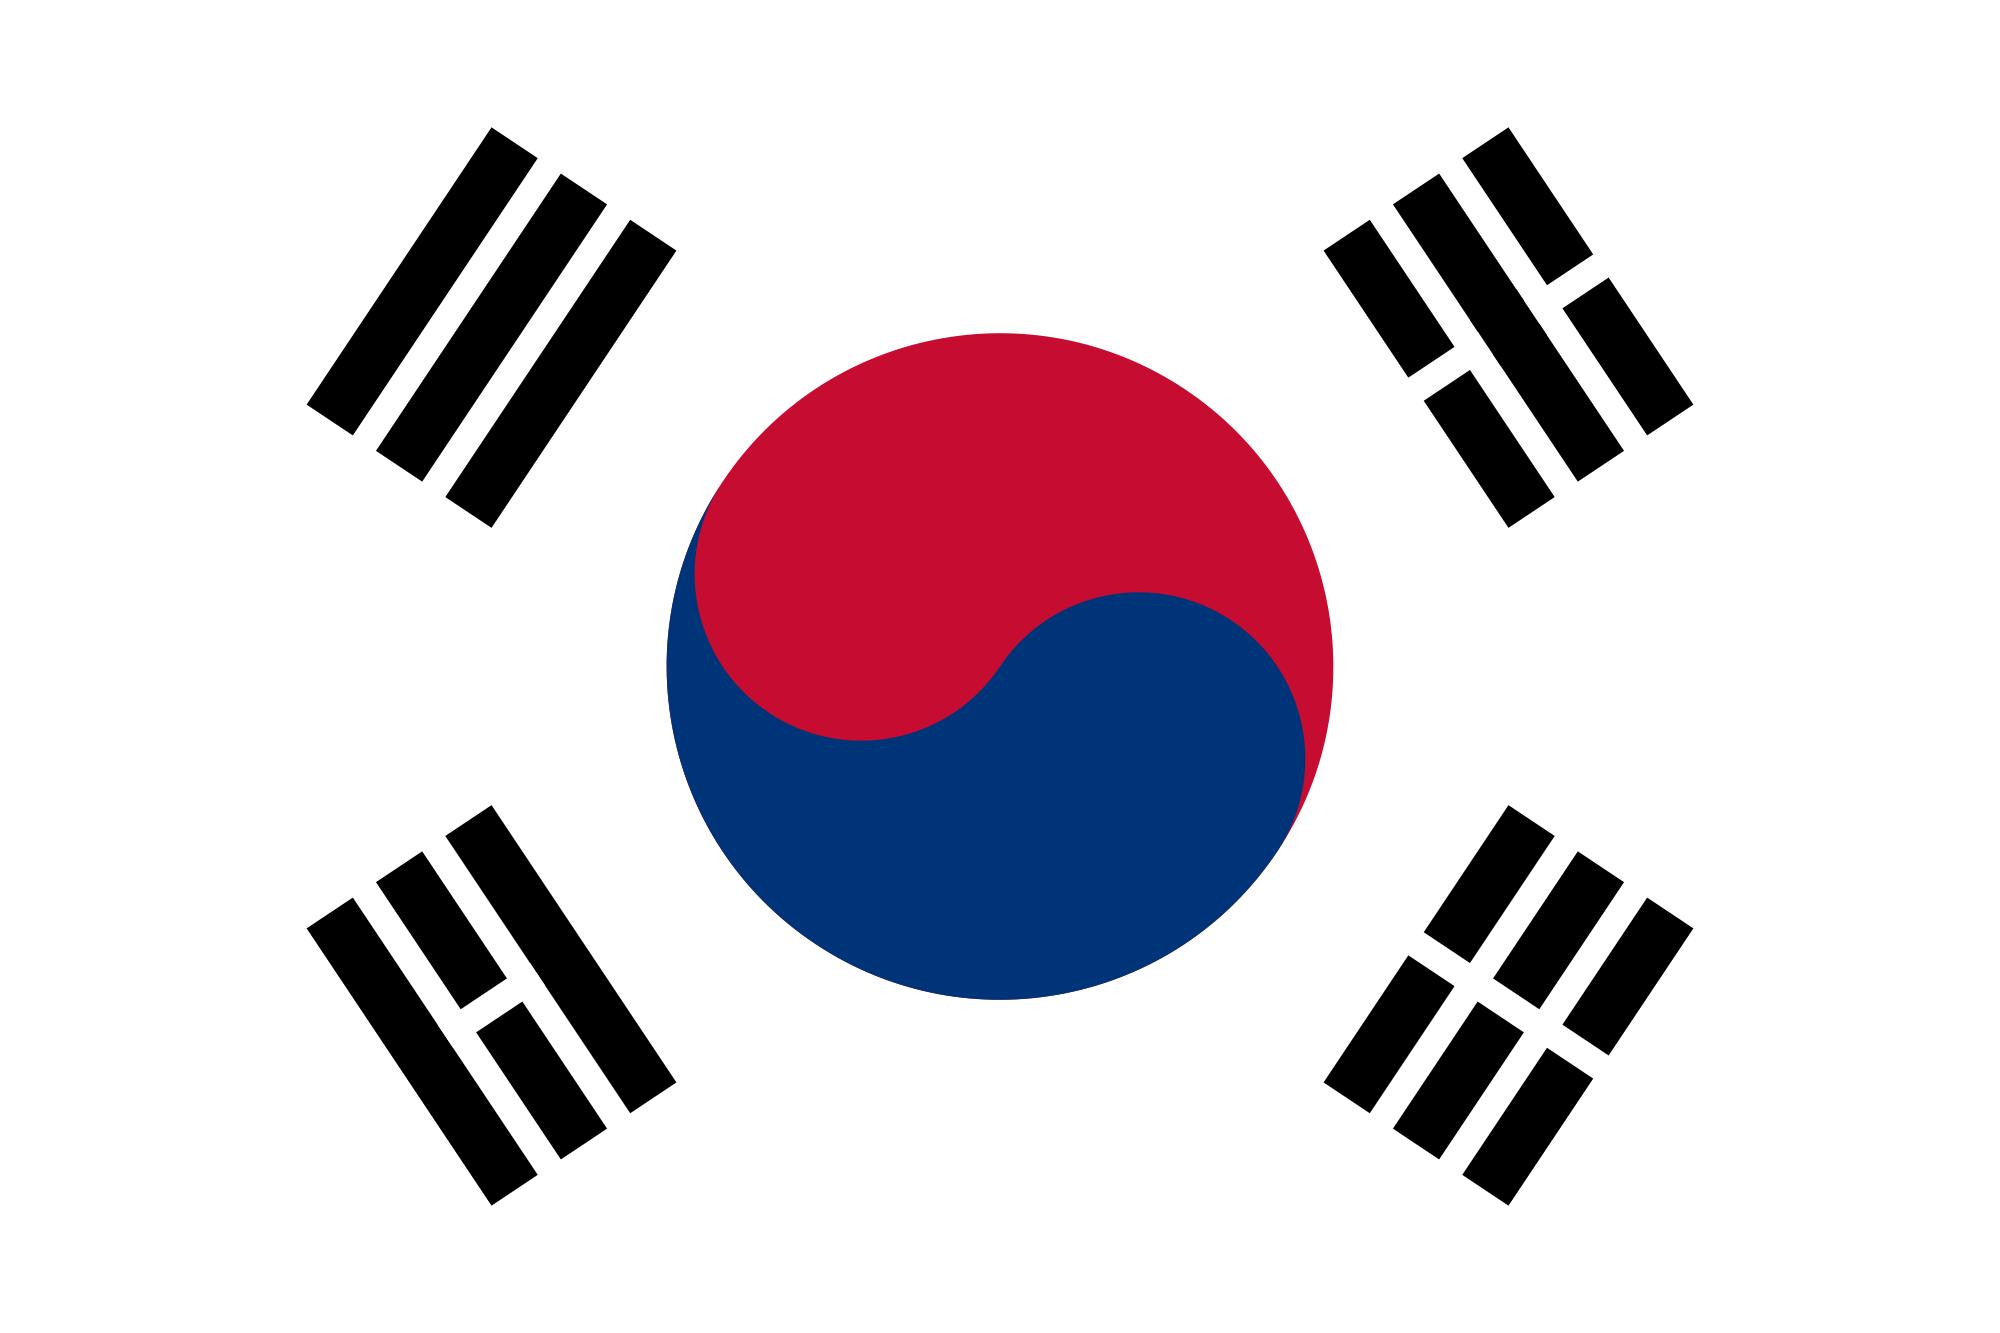 South Korea Country Flag Lambang Negara Korea Selatan Bendera